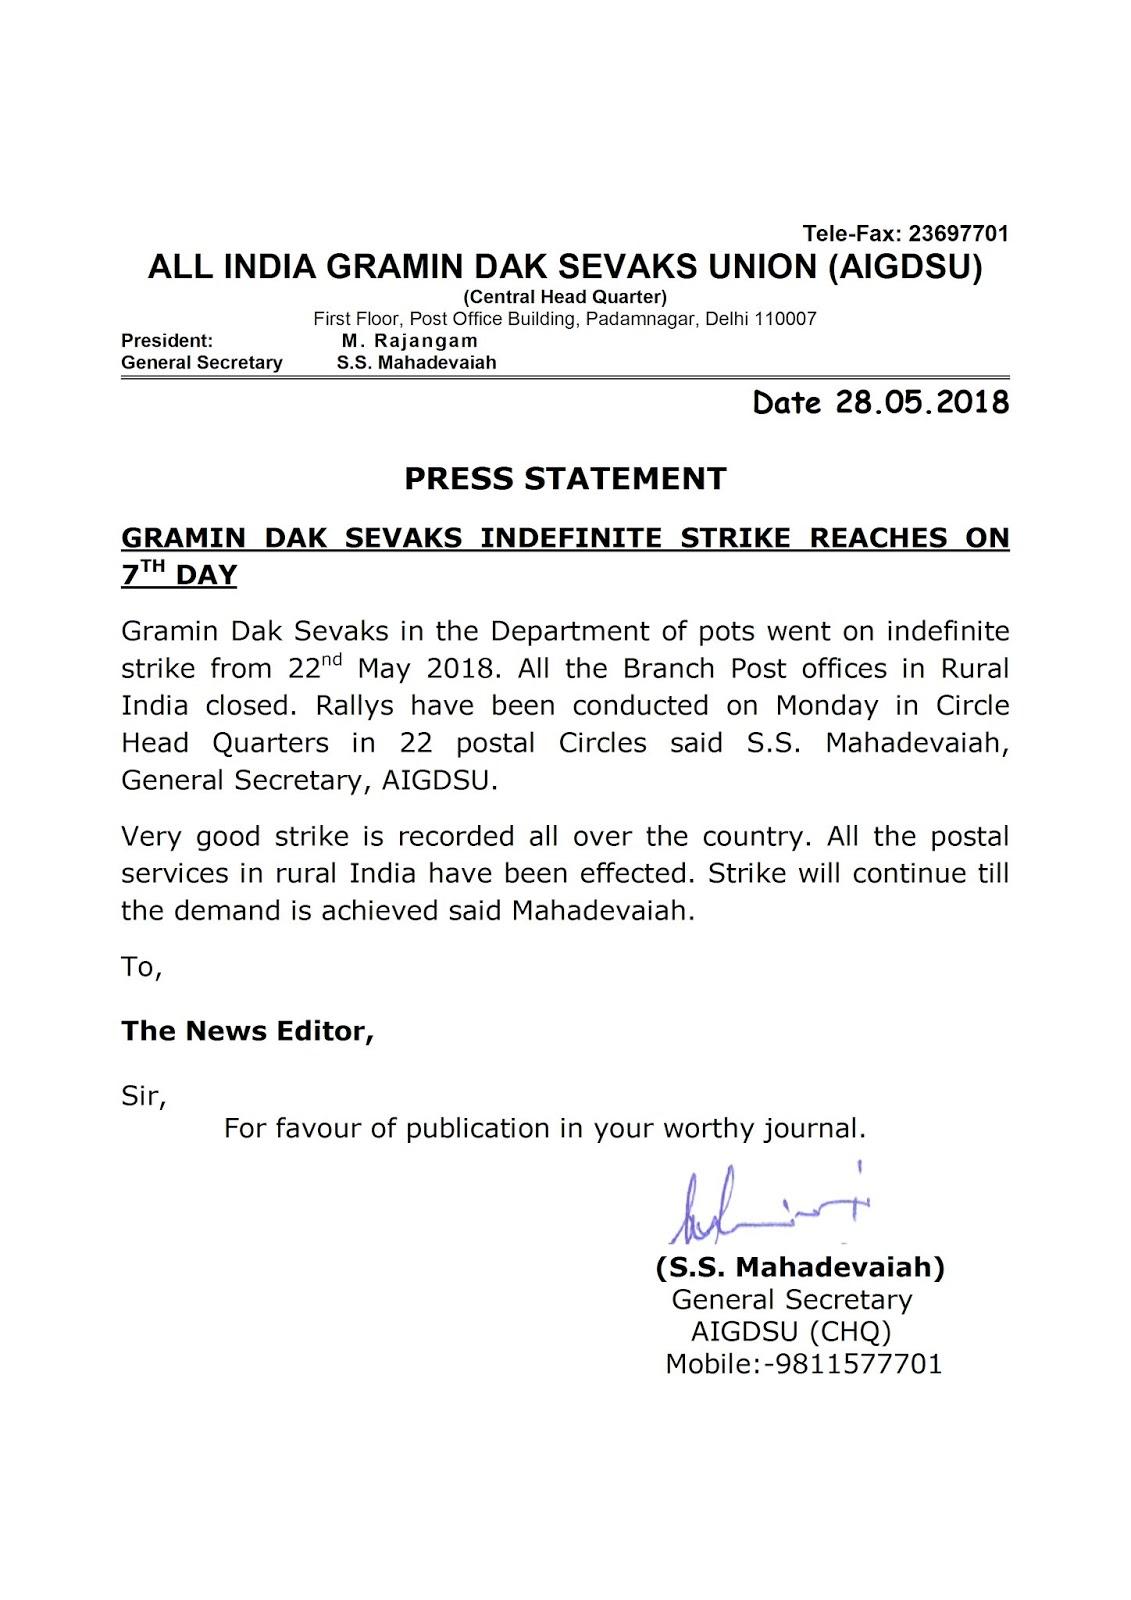 GDS Indefinite Strike : 7th Day Press Statement